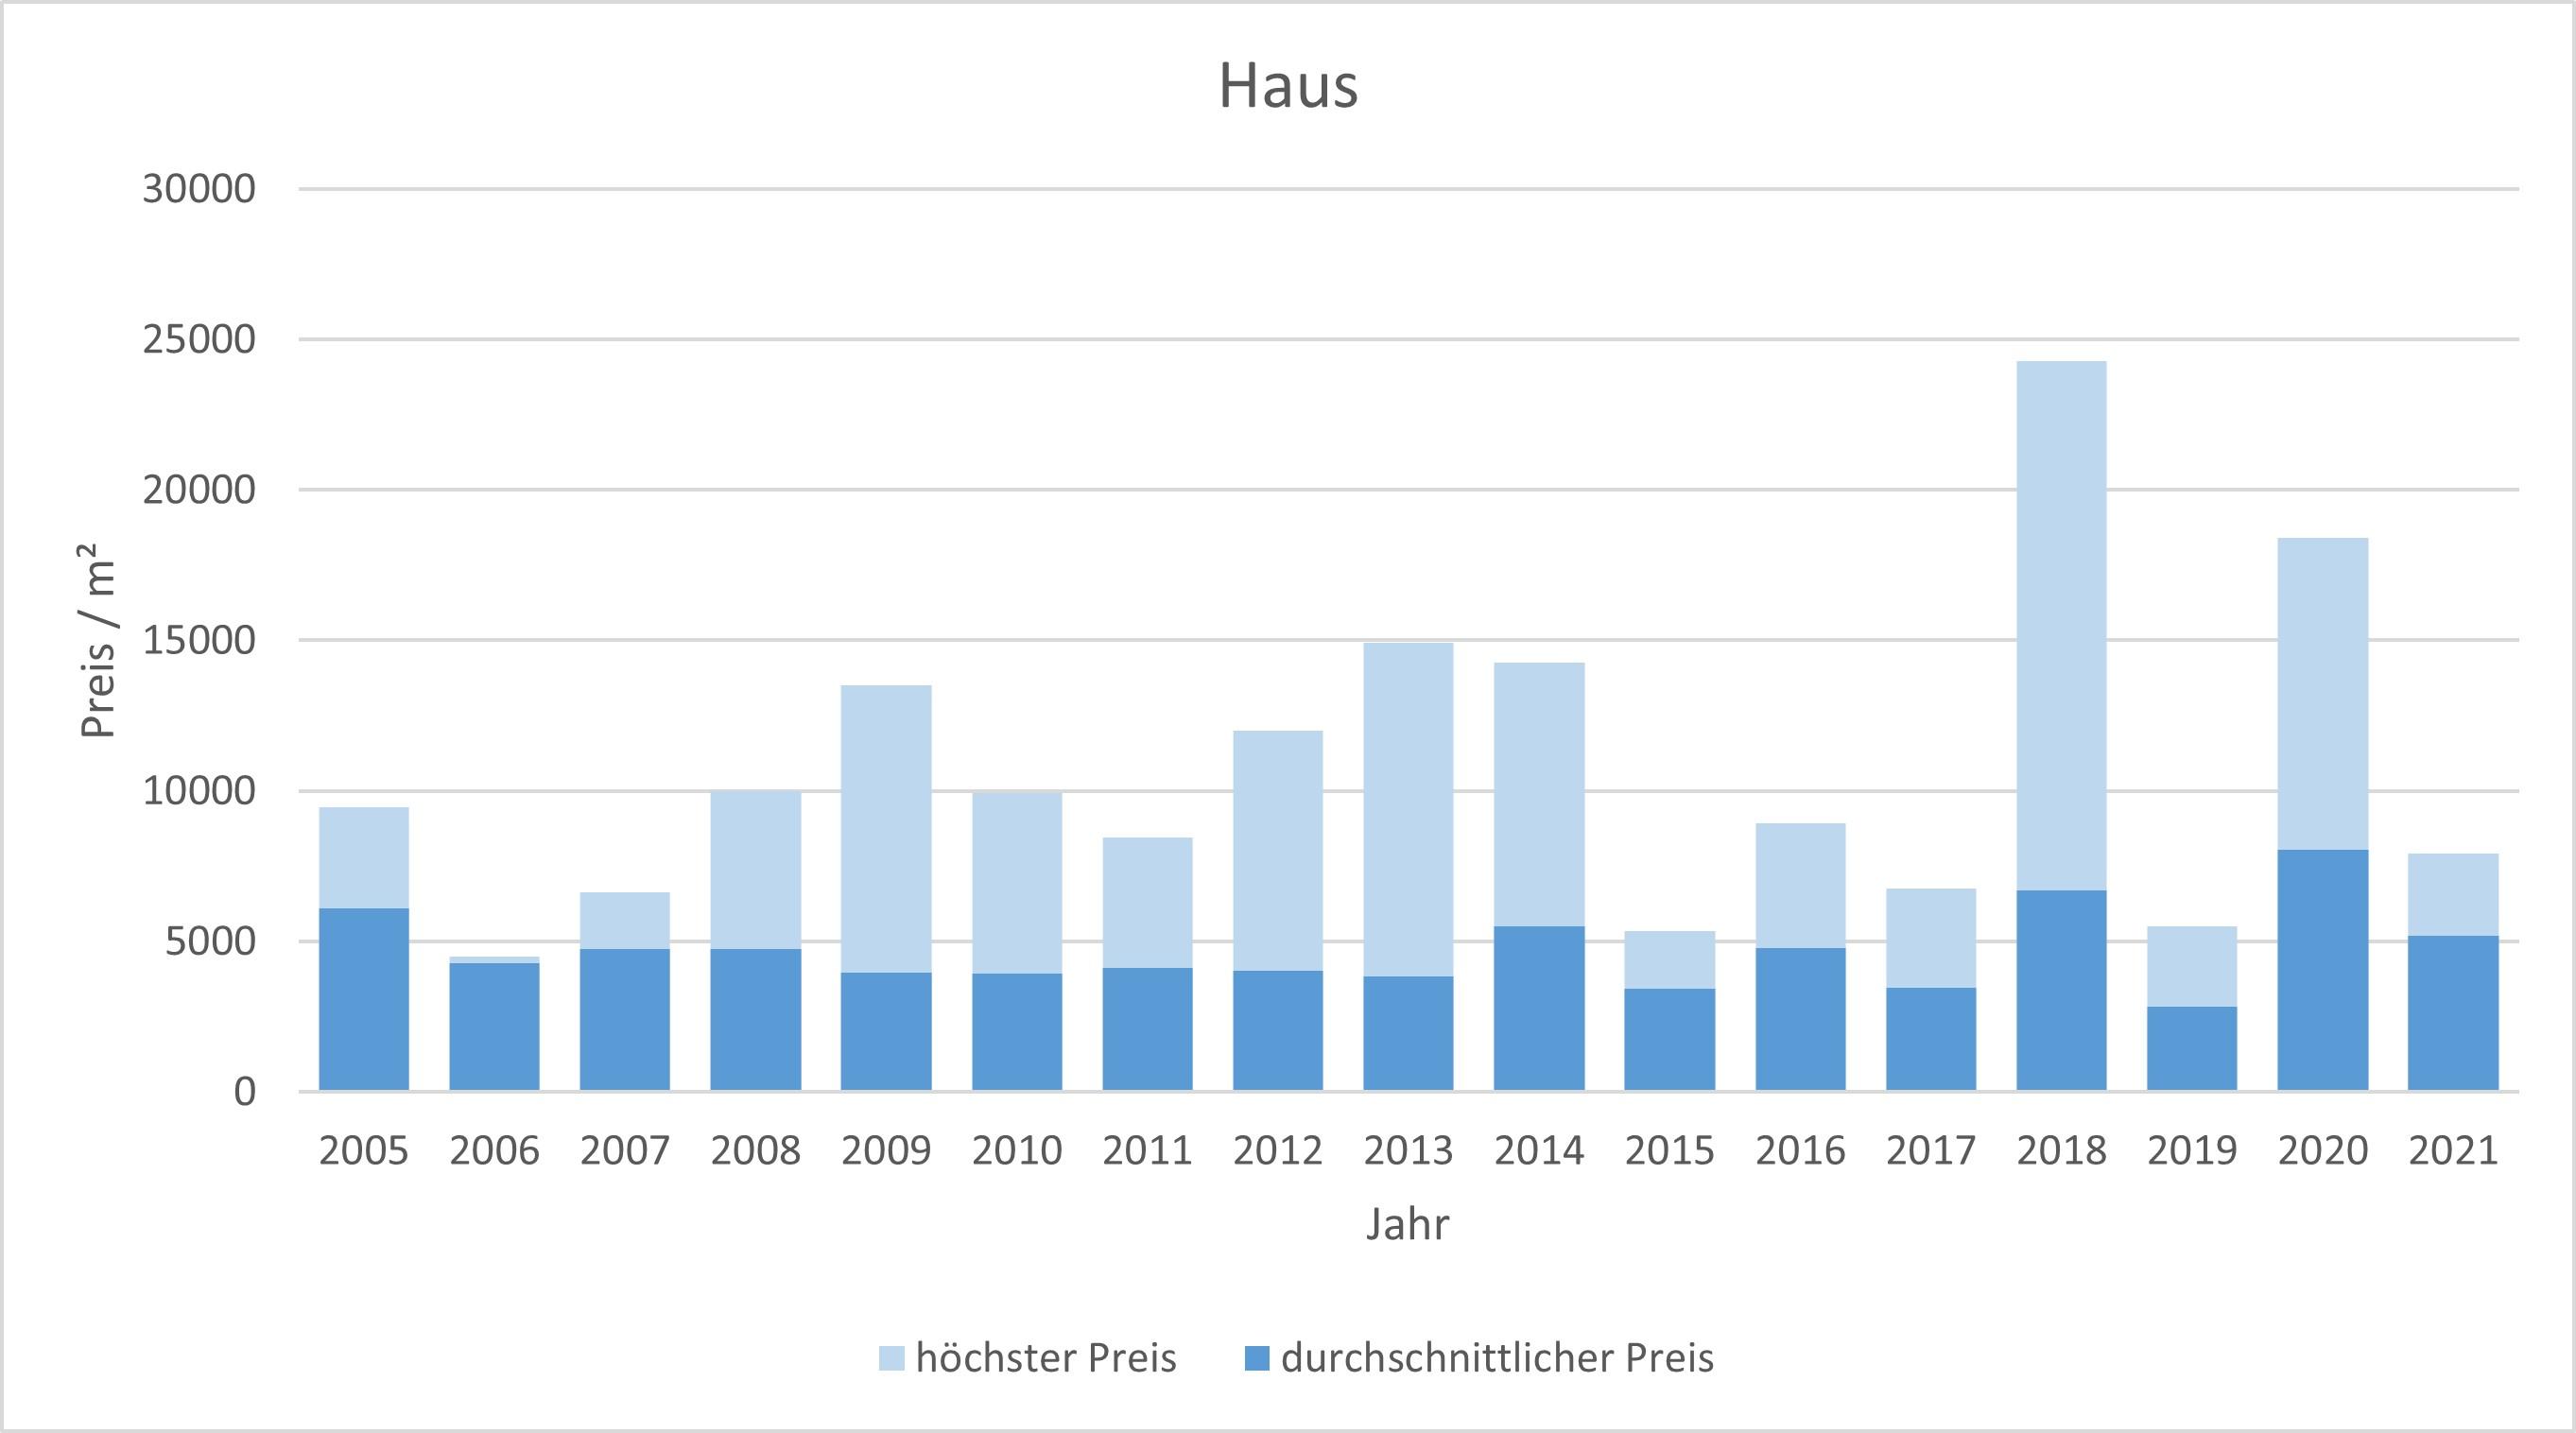 München - Altstadt Haus kaufen verkaufen Preis Bewertung Makler www.happy-immo.de 2019 2020 2021